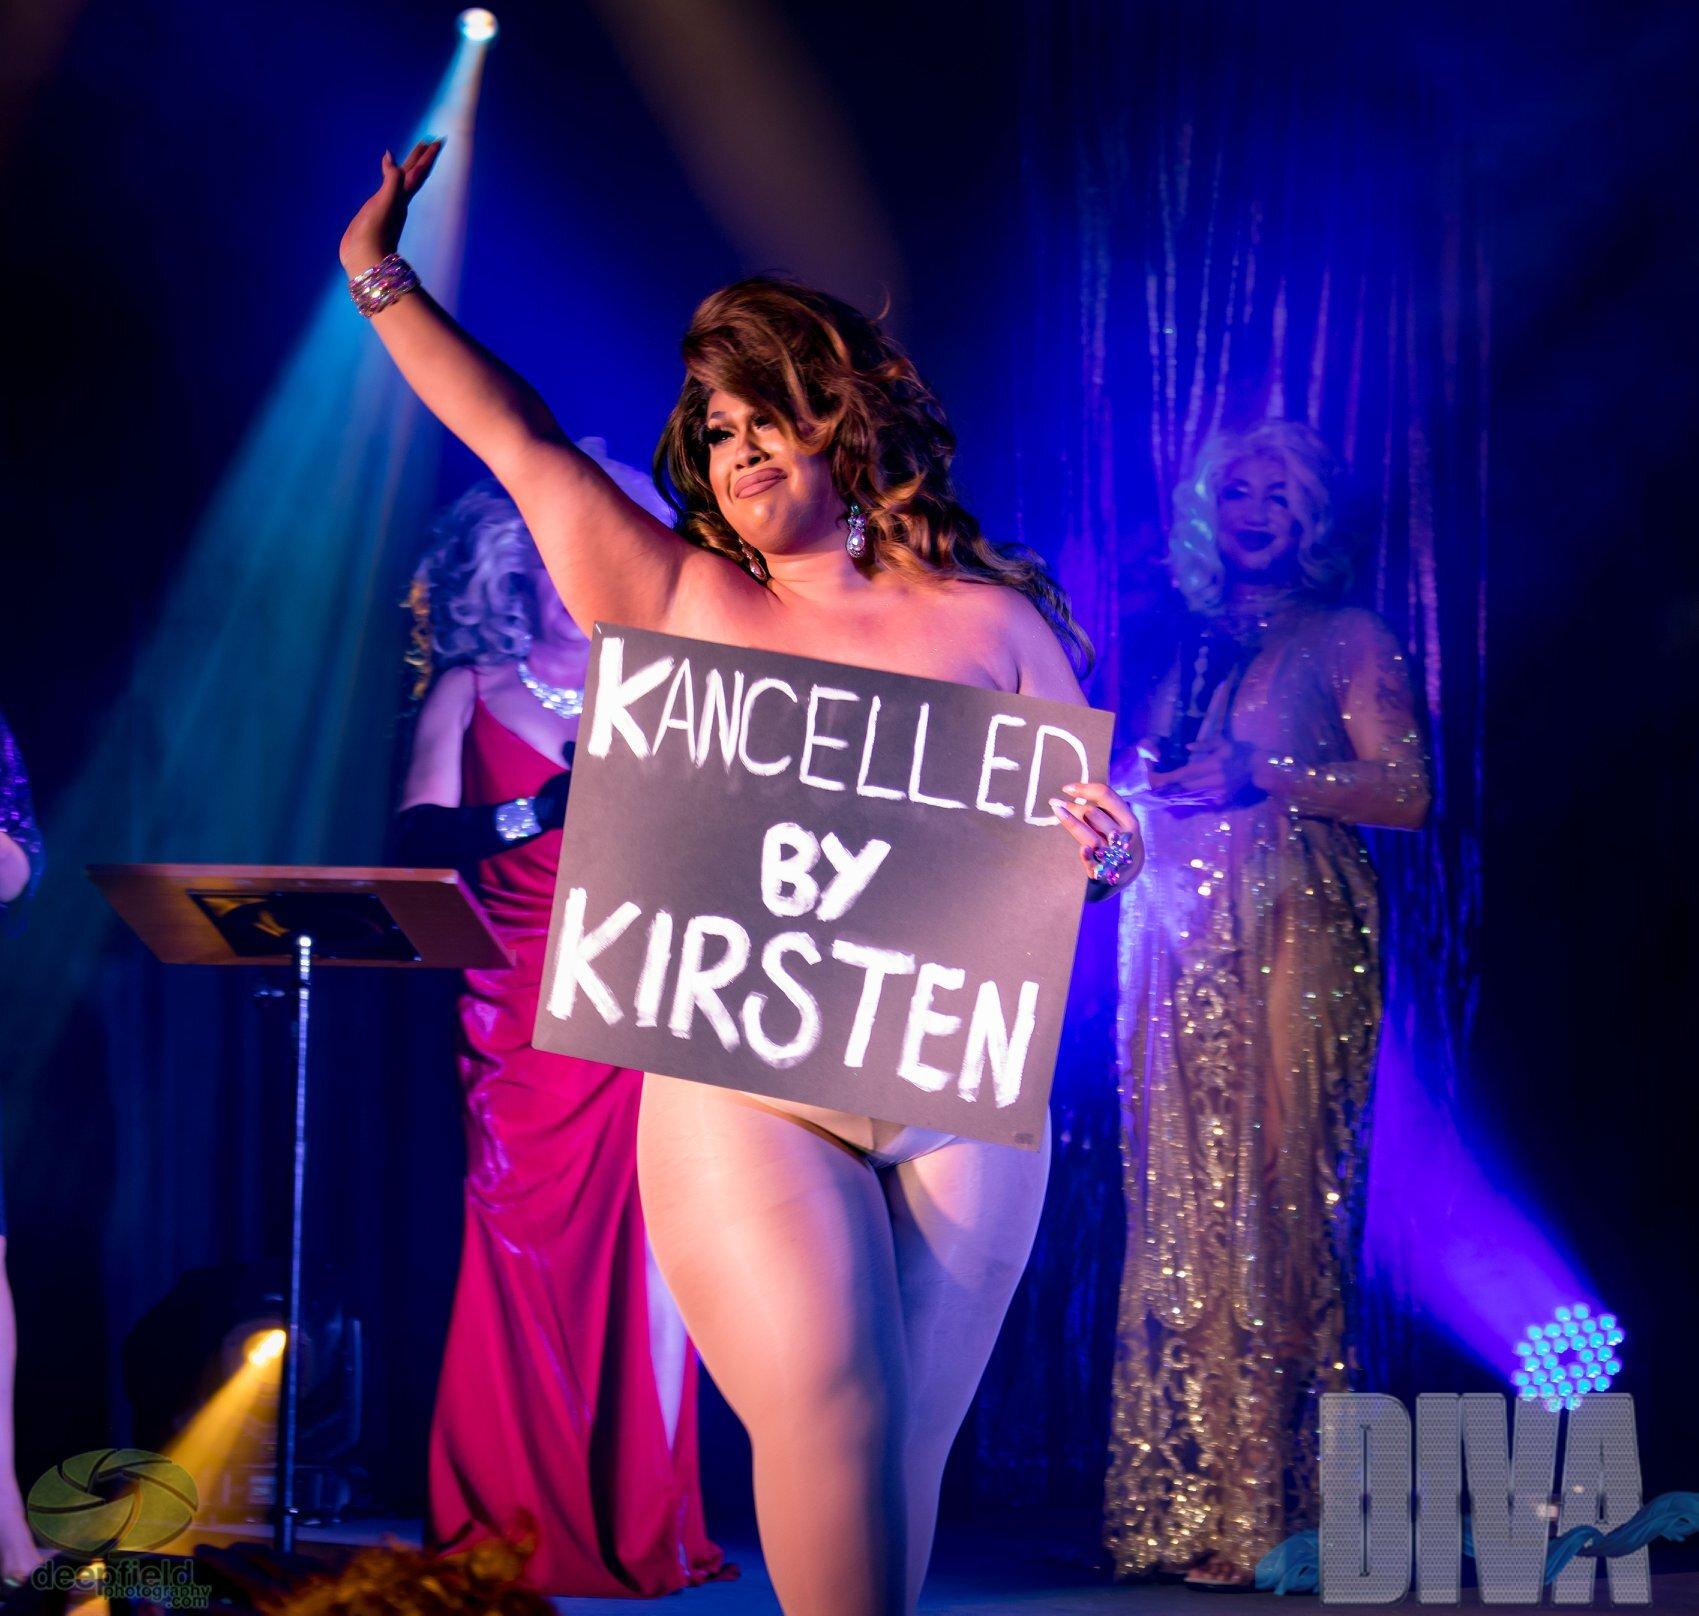 coco-jumbo-favourite-winner-win-diva-awards-sydney-drag-queen-royalty-best-hire-drag-race-australia.jpg